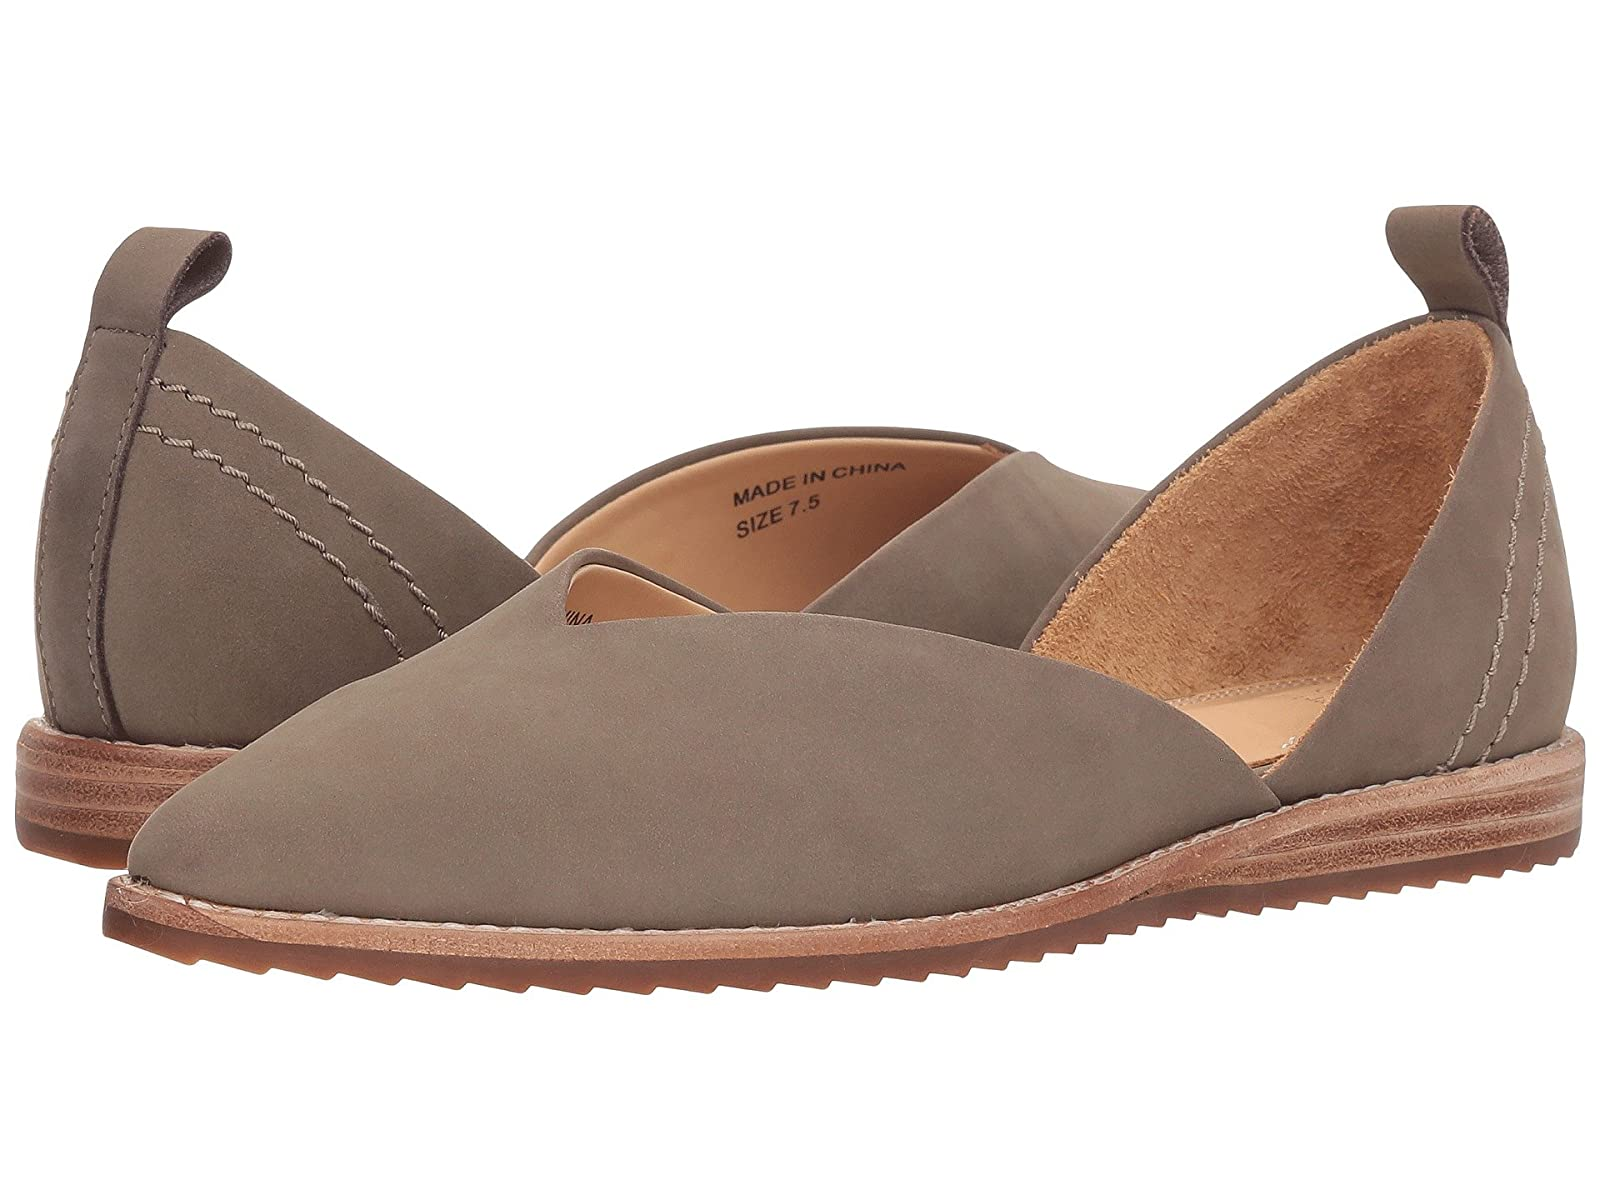 Bill Blass SybilAtmospheric grades have affordable shoes